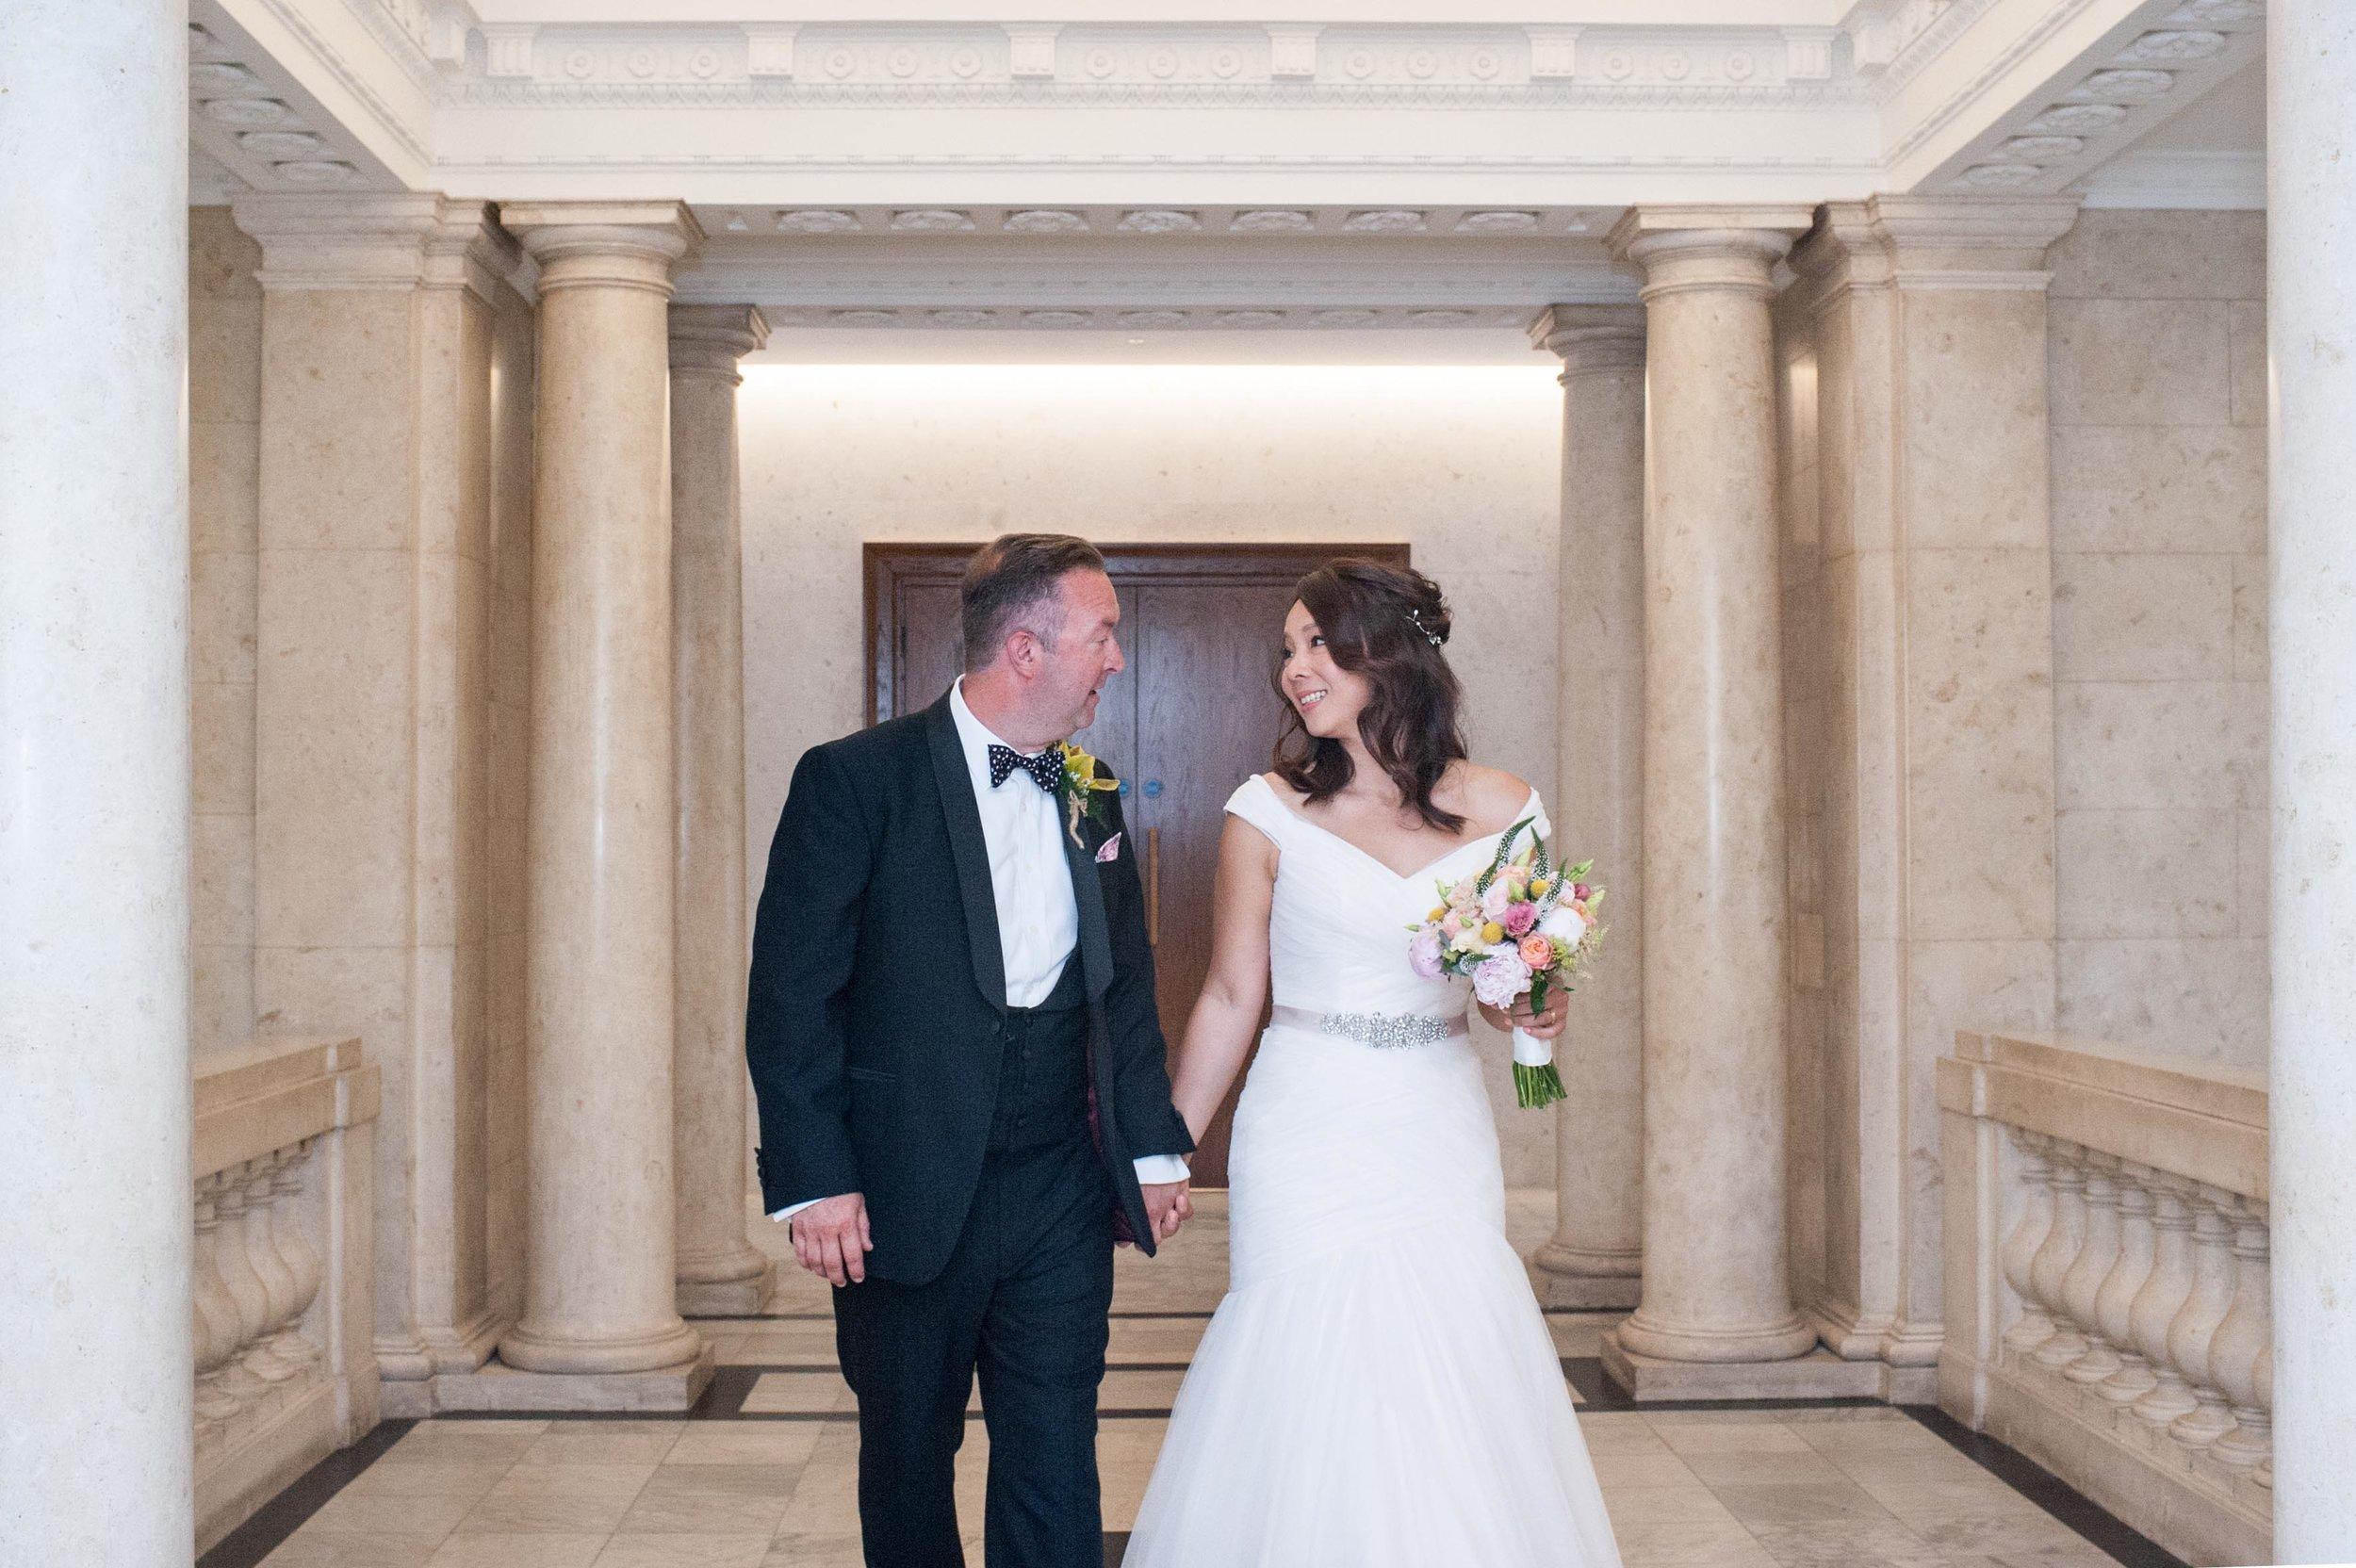 D&M_Marylebone Town Hall Wedding (122 of 239).jpg